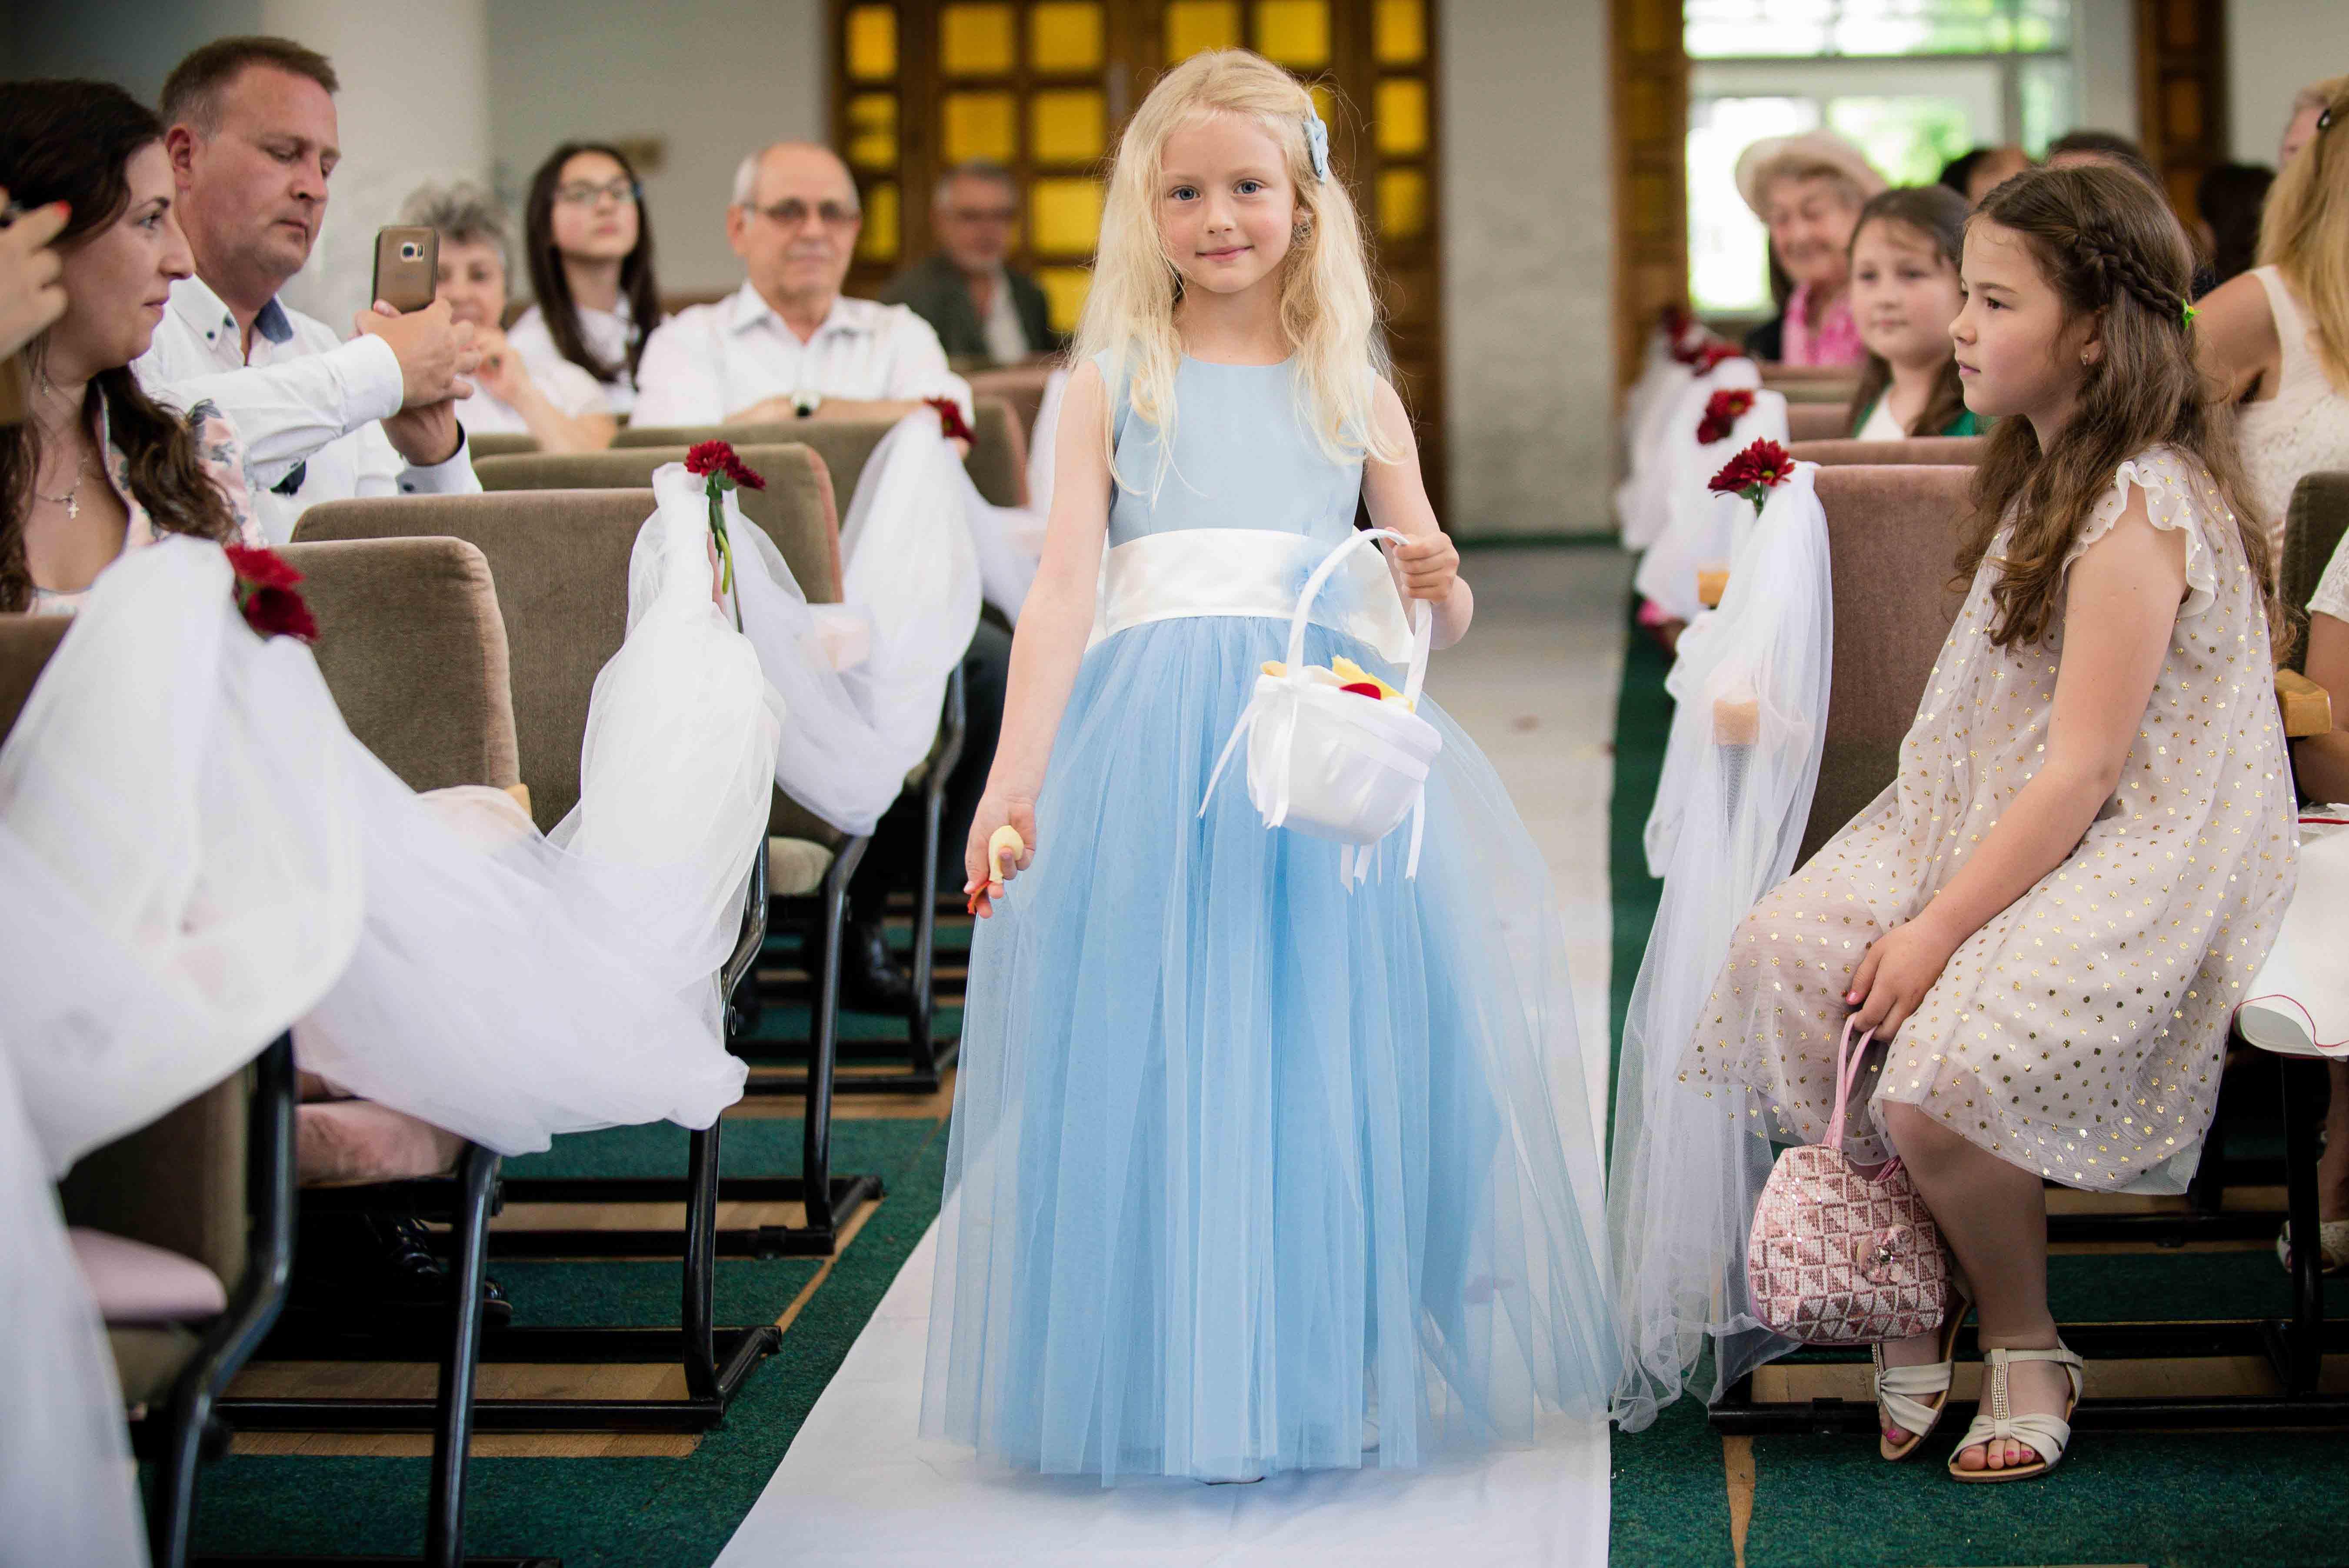 Fotograf nunta Bucuresti, Ploiesti, Brasov - Catalin Soare. Ceremonie religioasa in Brasov.